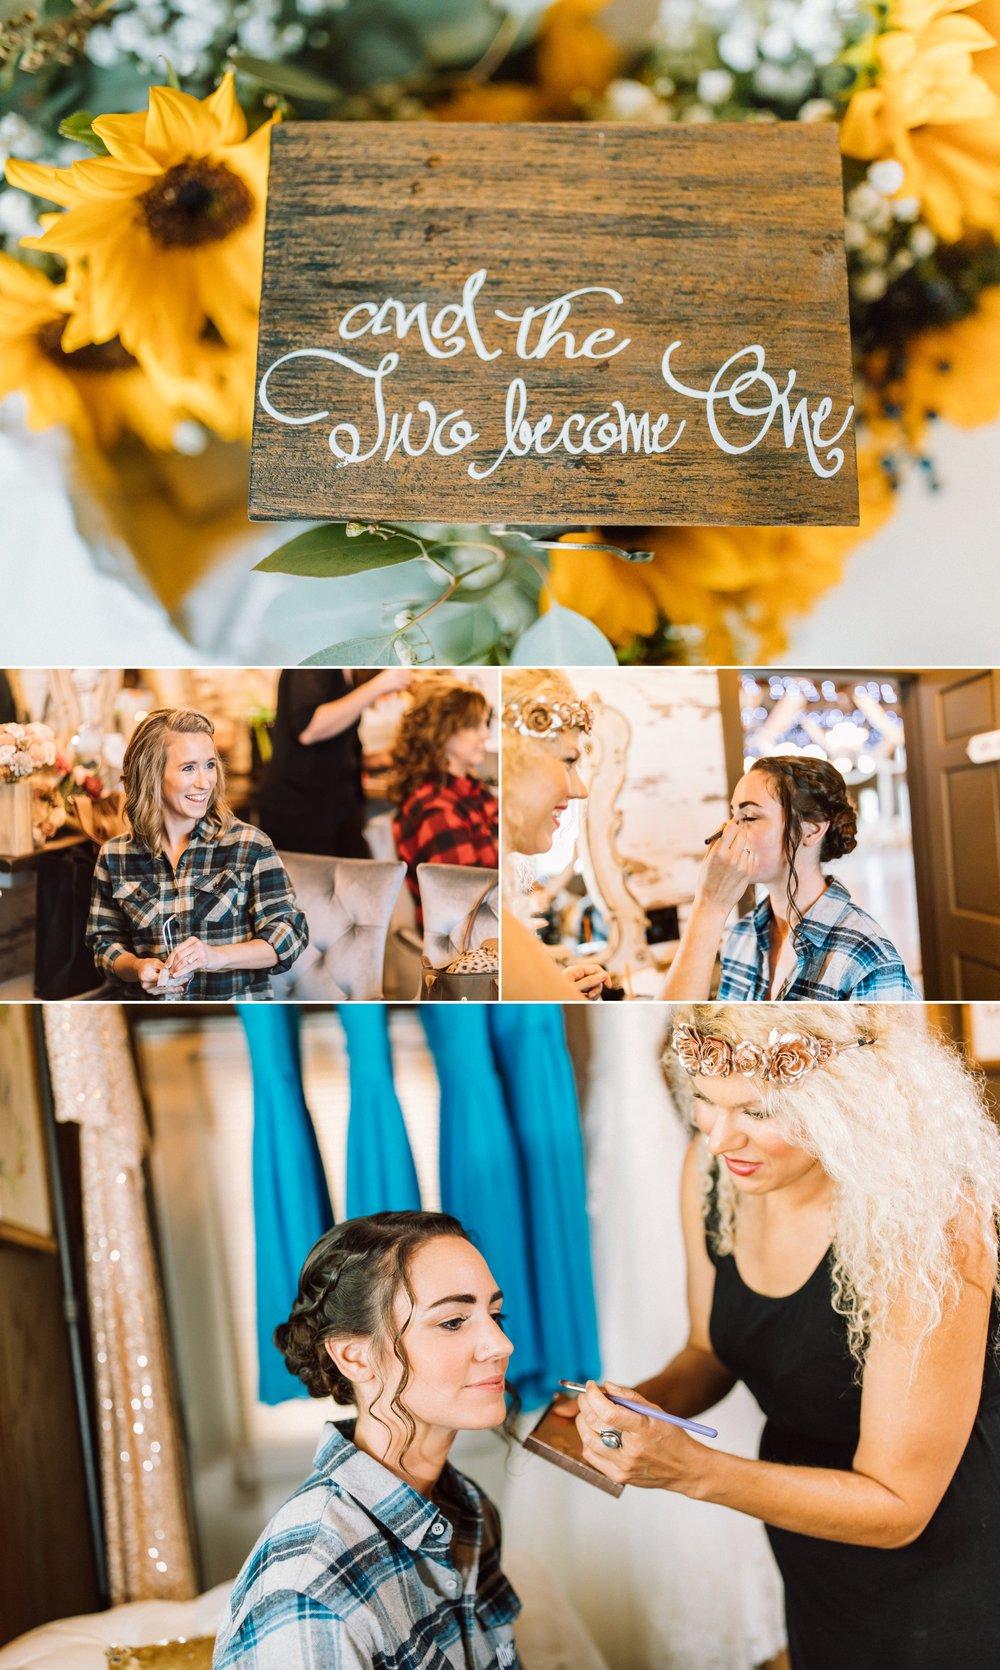 Rustic Sunflower & Blueberry Barn Wedding- Ever After Farms - Allie & NickBlog 4.jpg